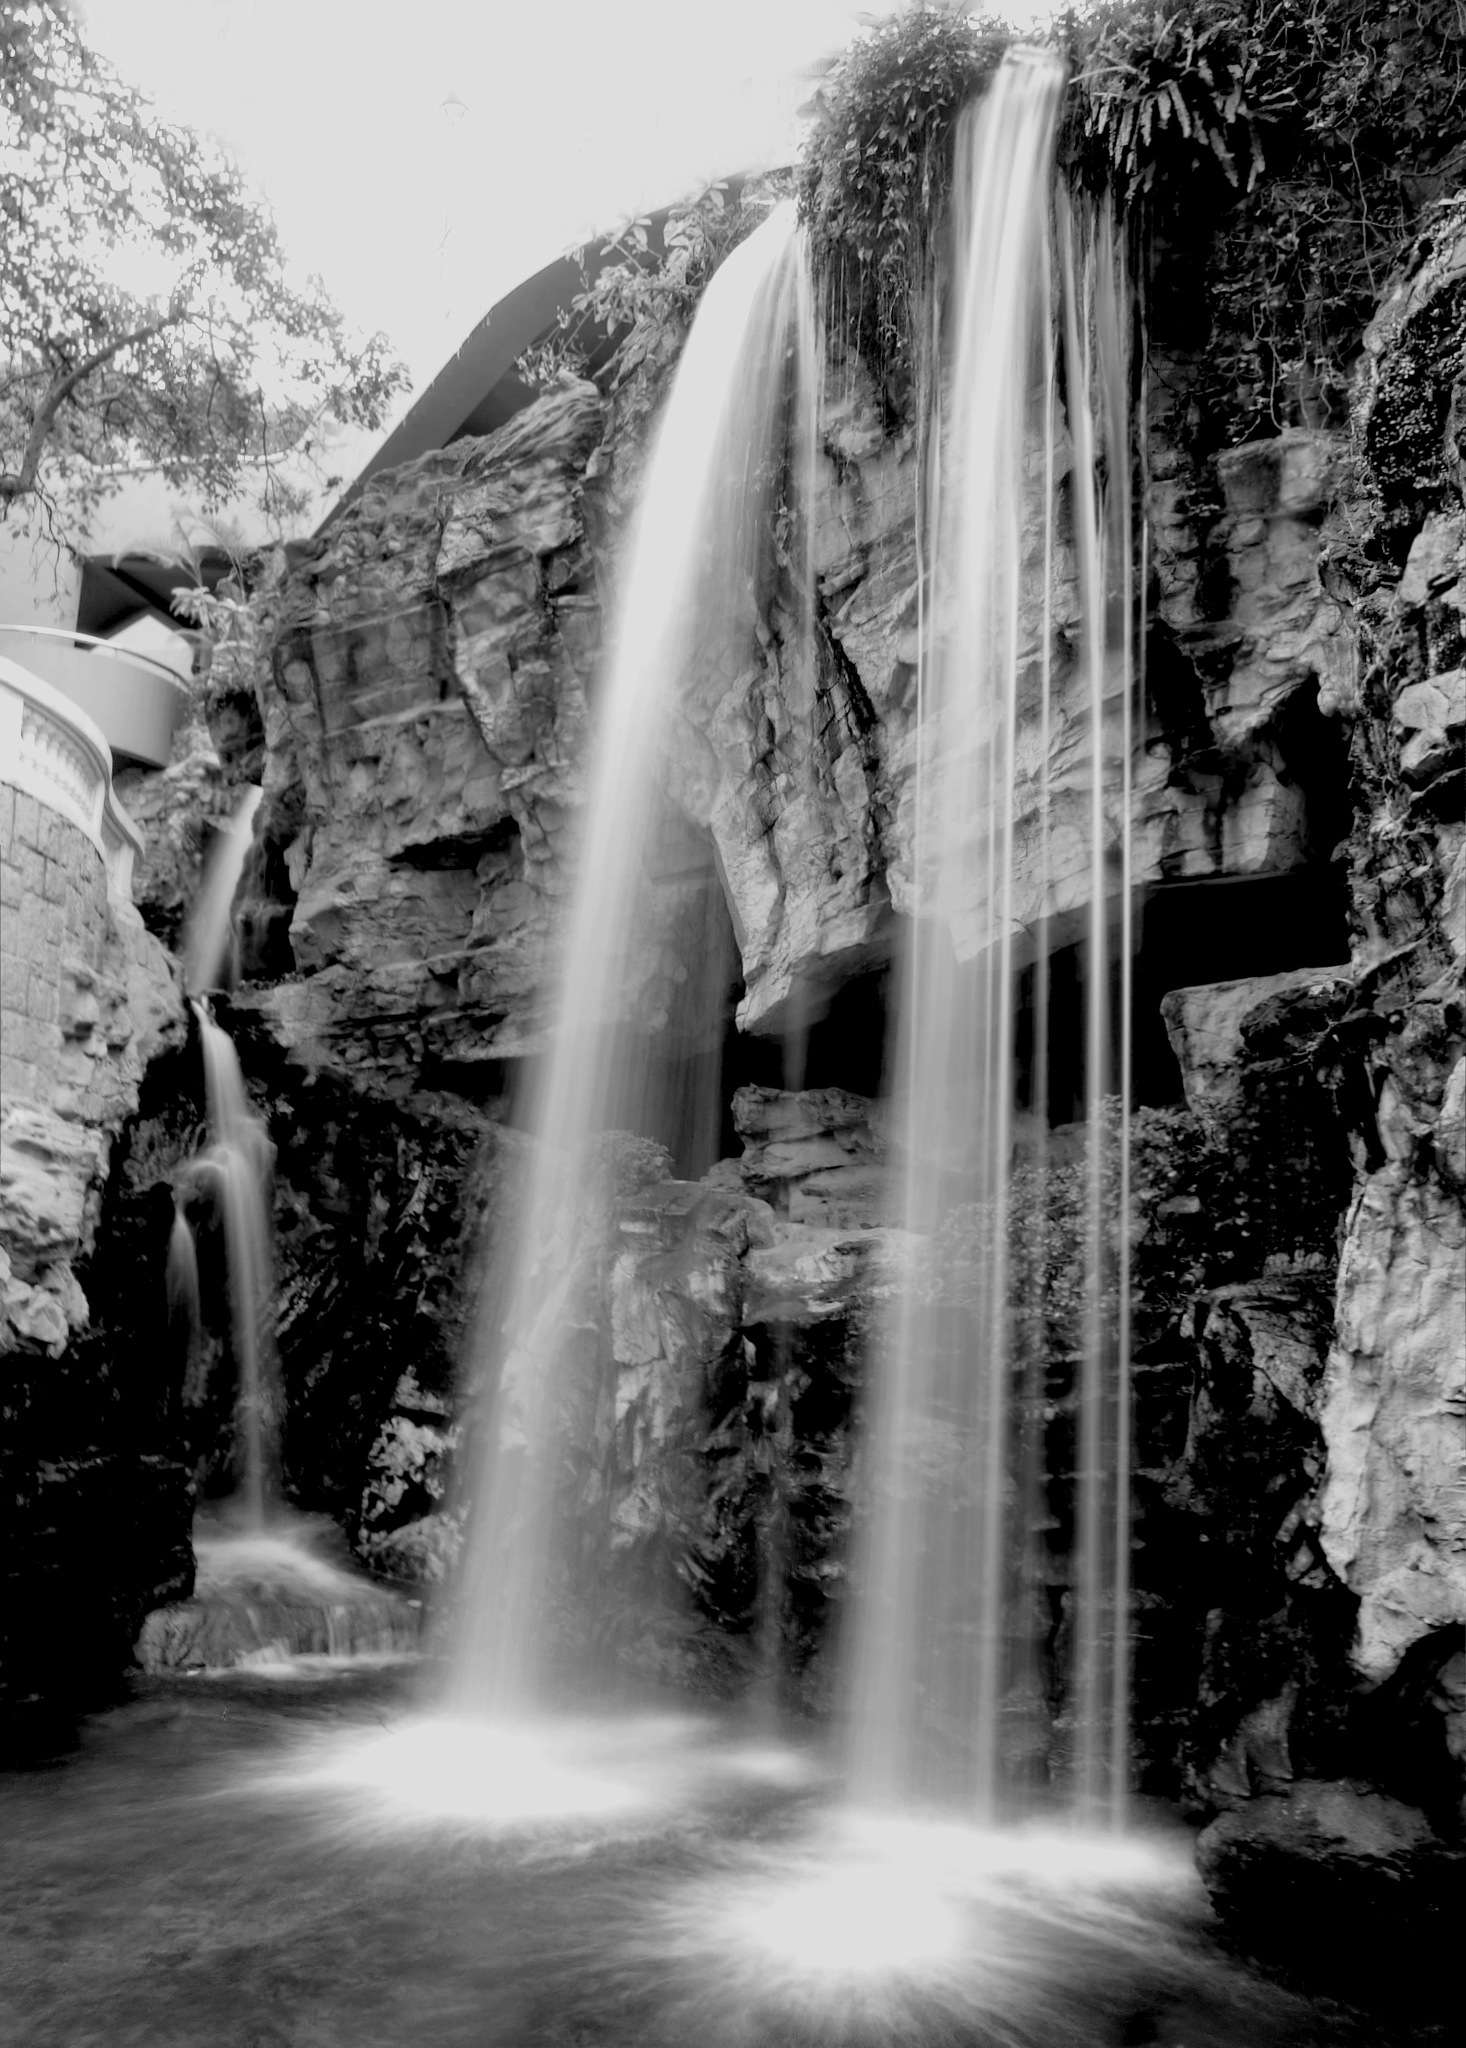 Waterfall-1 by pop88123